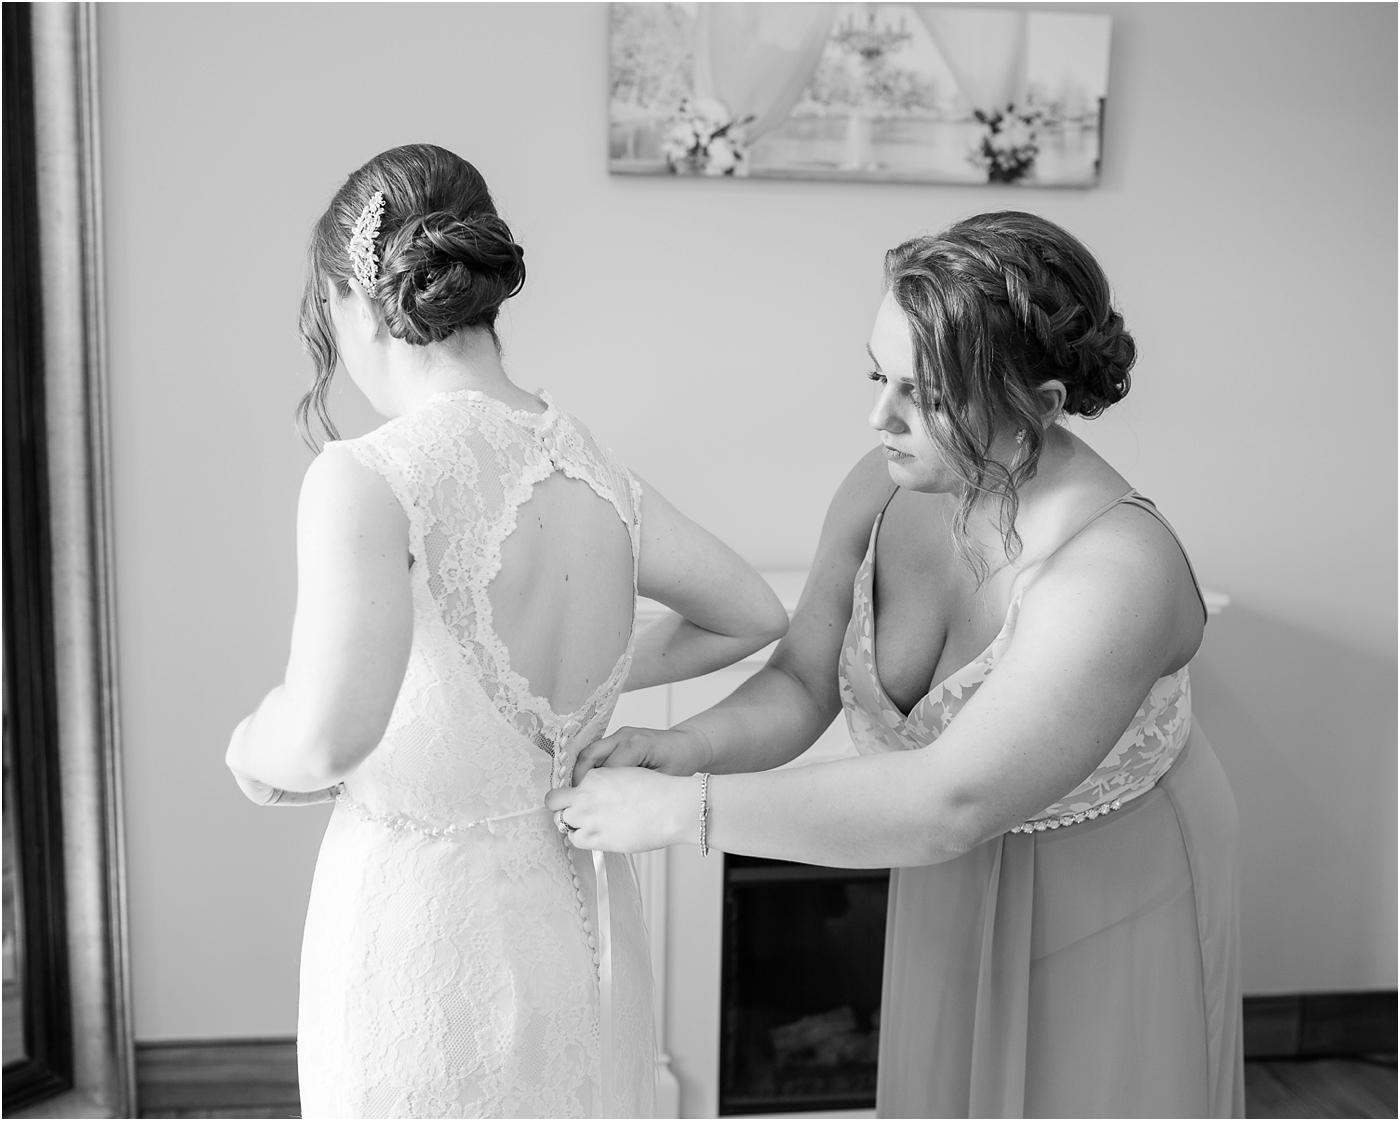 Gettysburg-lodges-wedding-photos-31.jpg